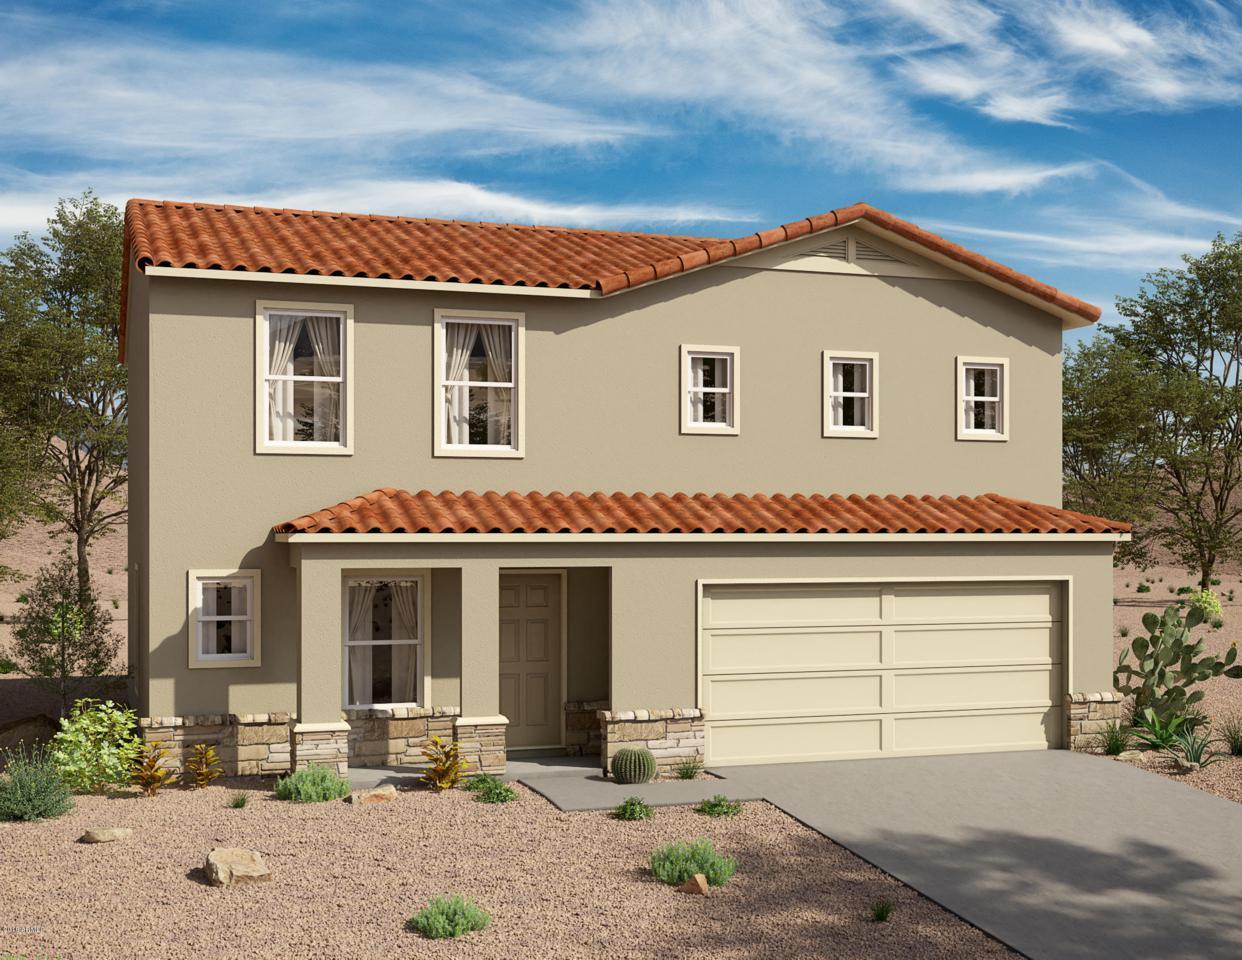 1670 Palo Verde Drive - Photo 1